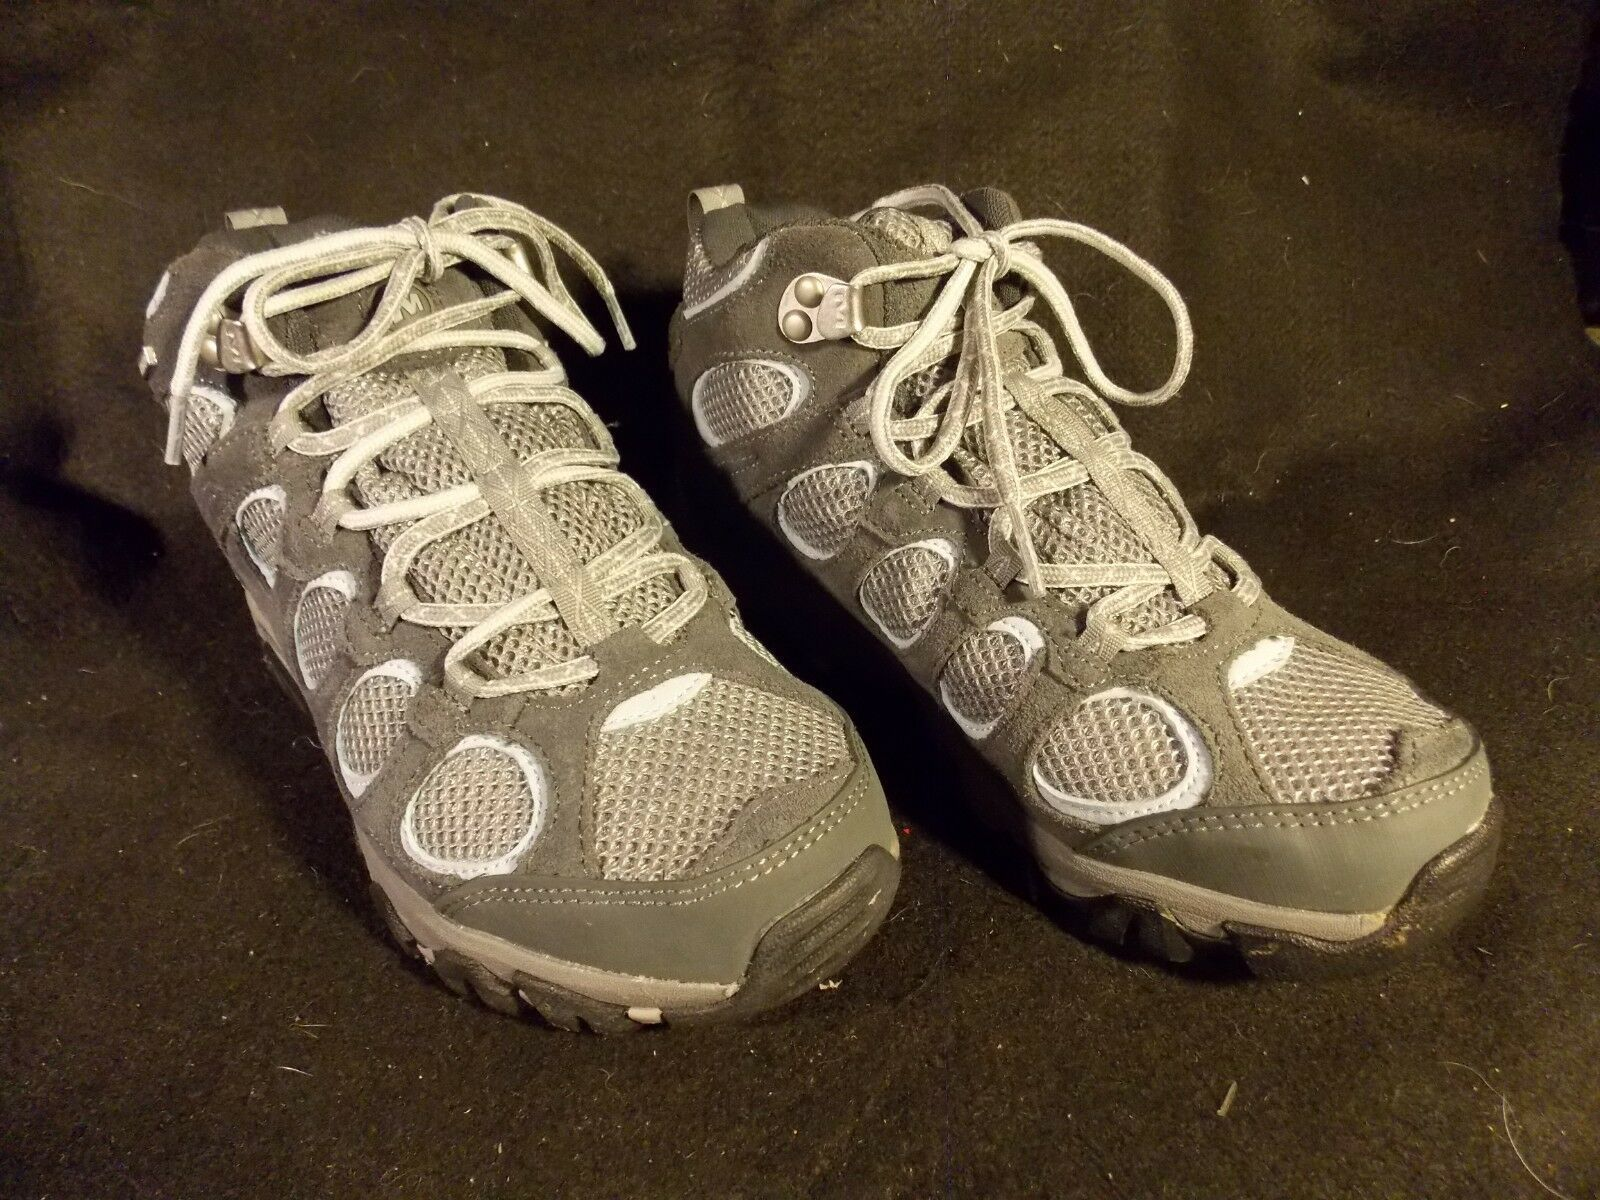 Women's Merrell Hilltop Vent Waterproof Castle Rock Gray Hiking Shoes Size 6